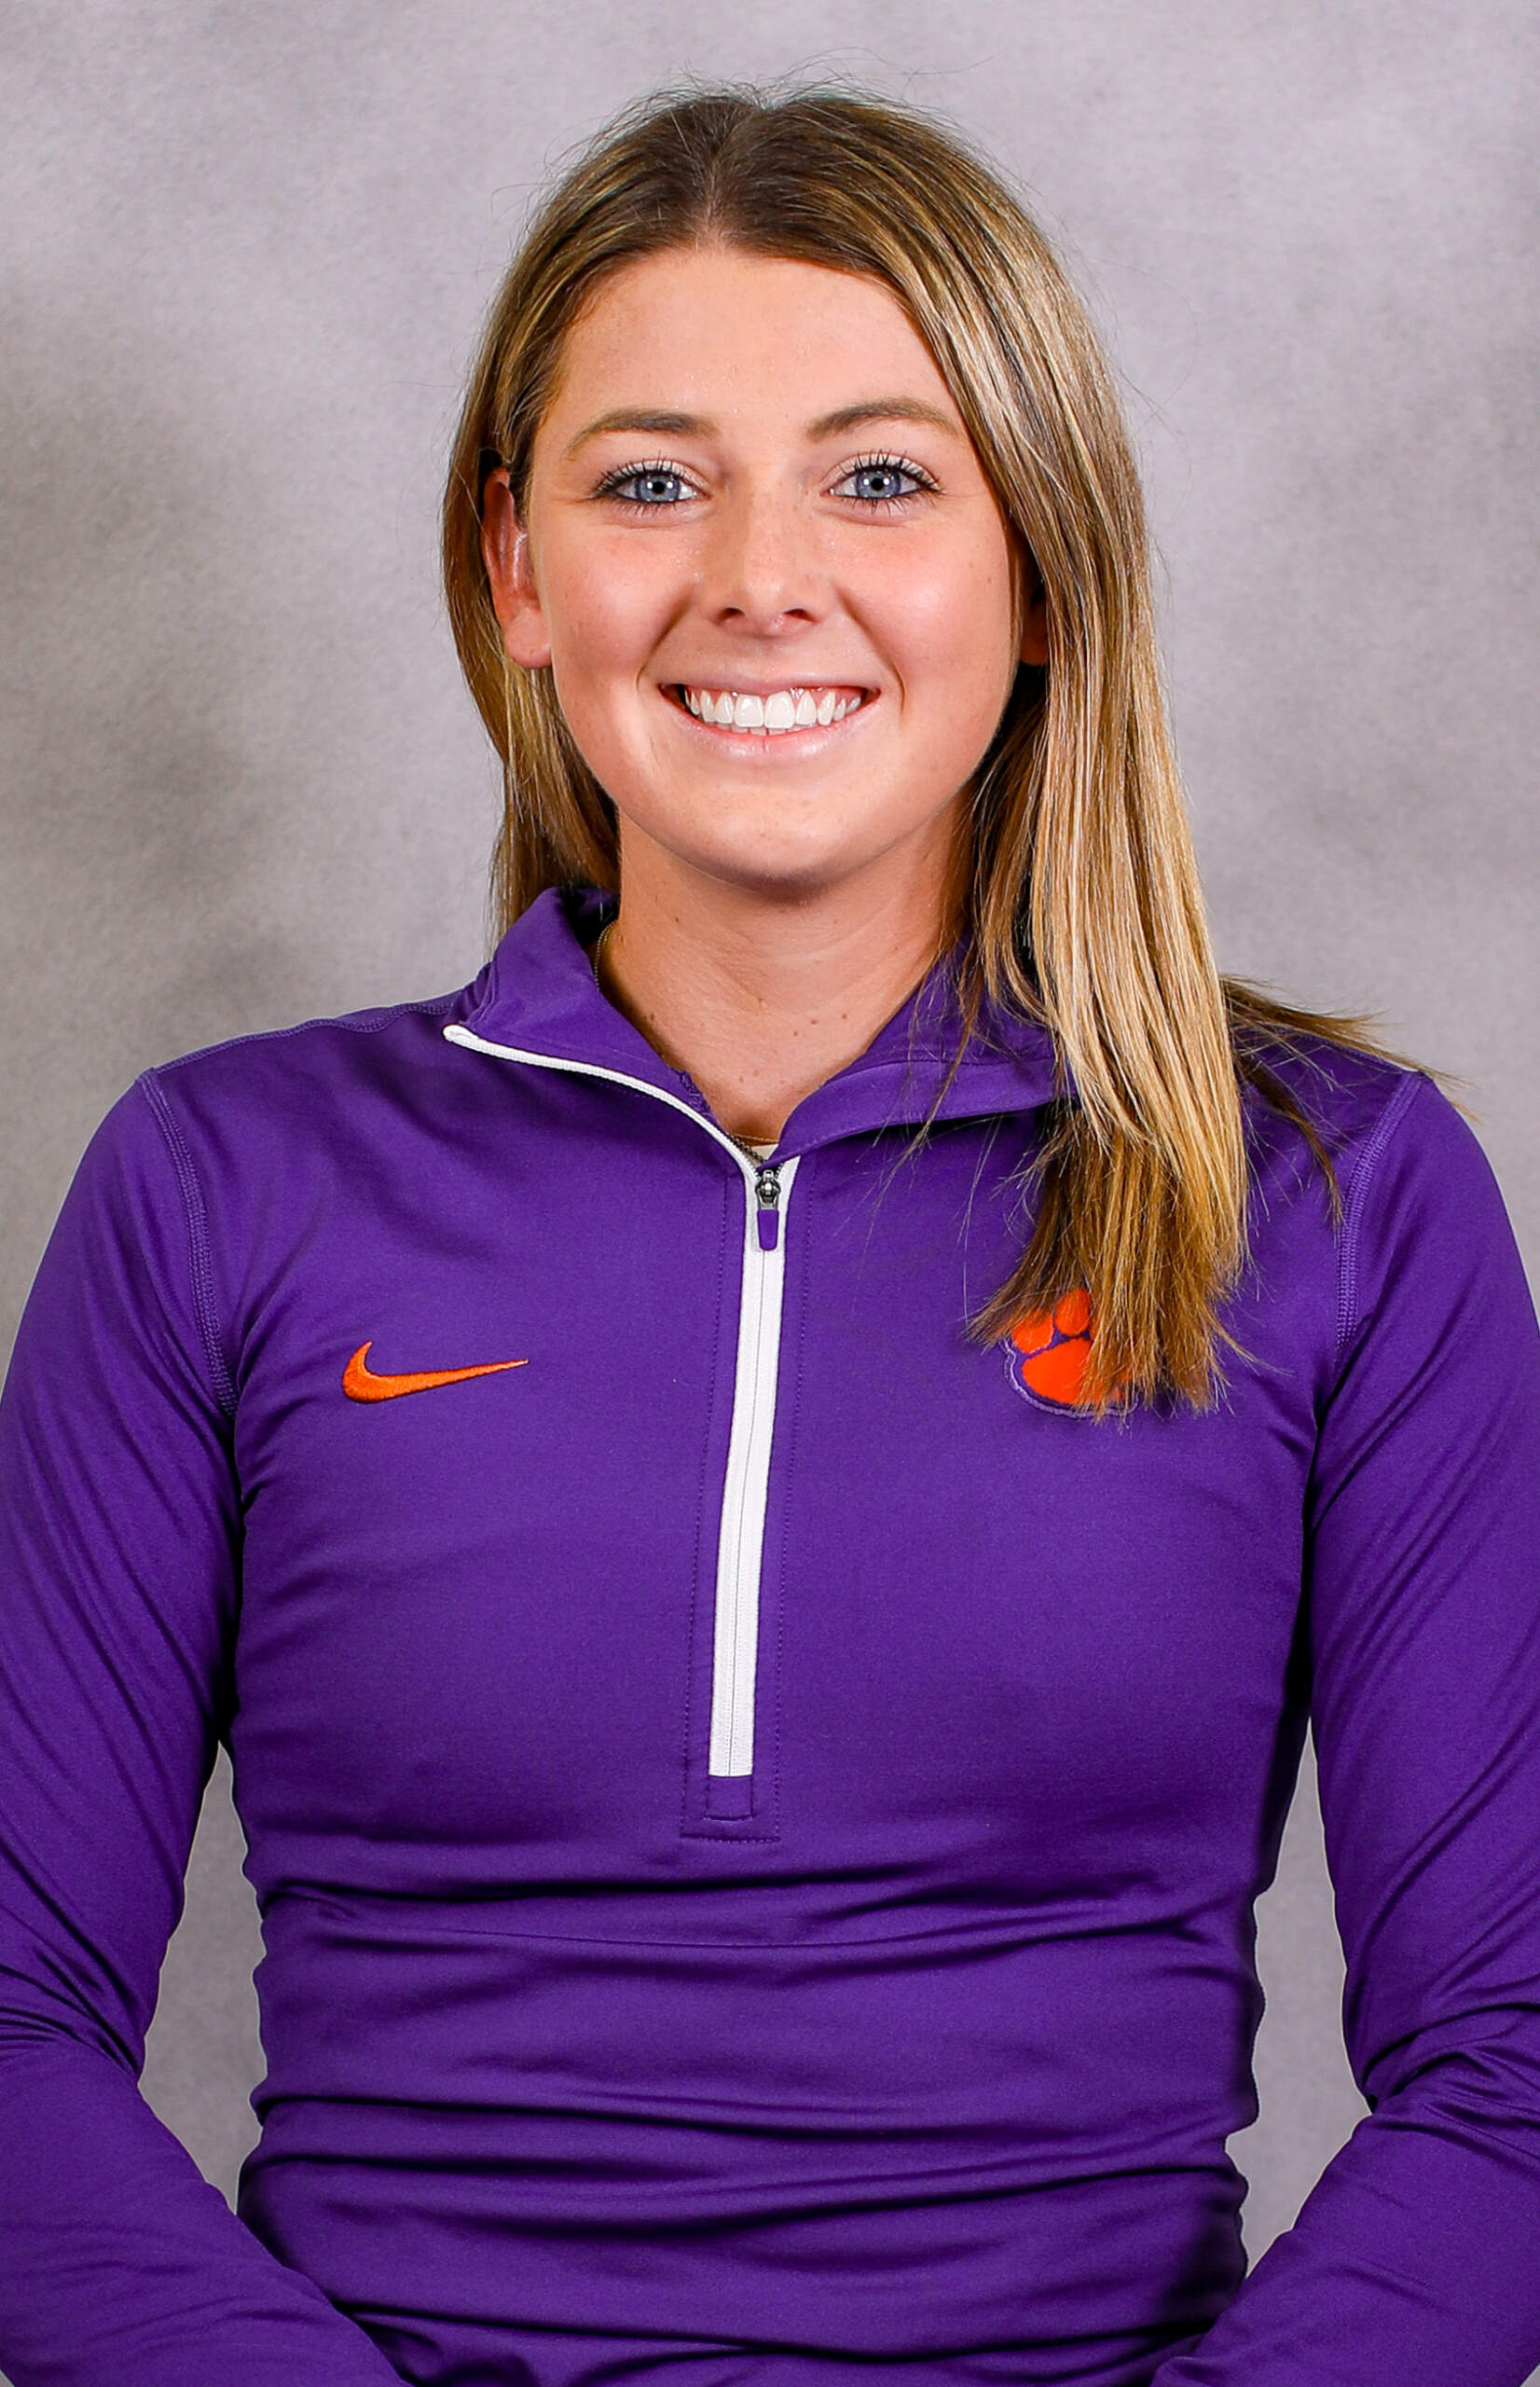 Ali DeSpain - Women's Tennis - Clemson University Athletics